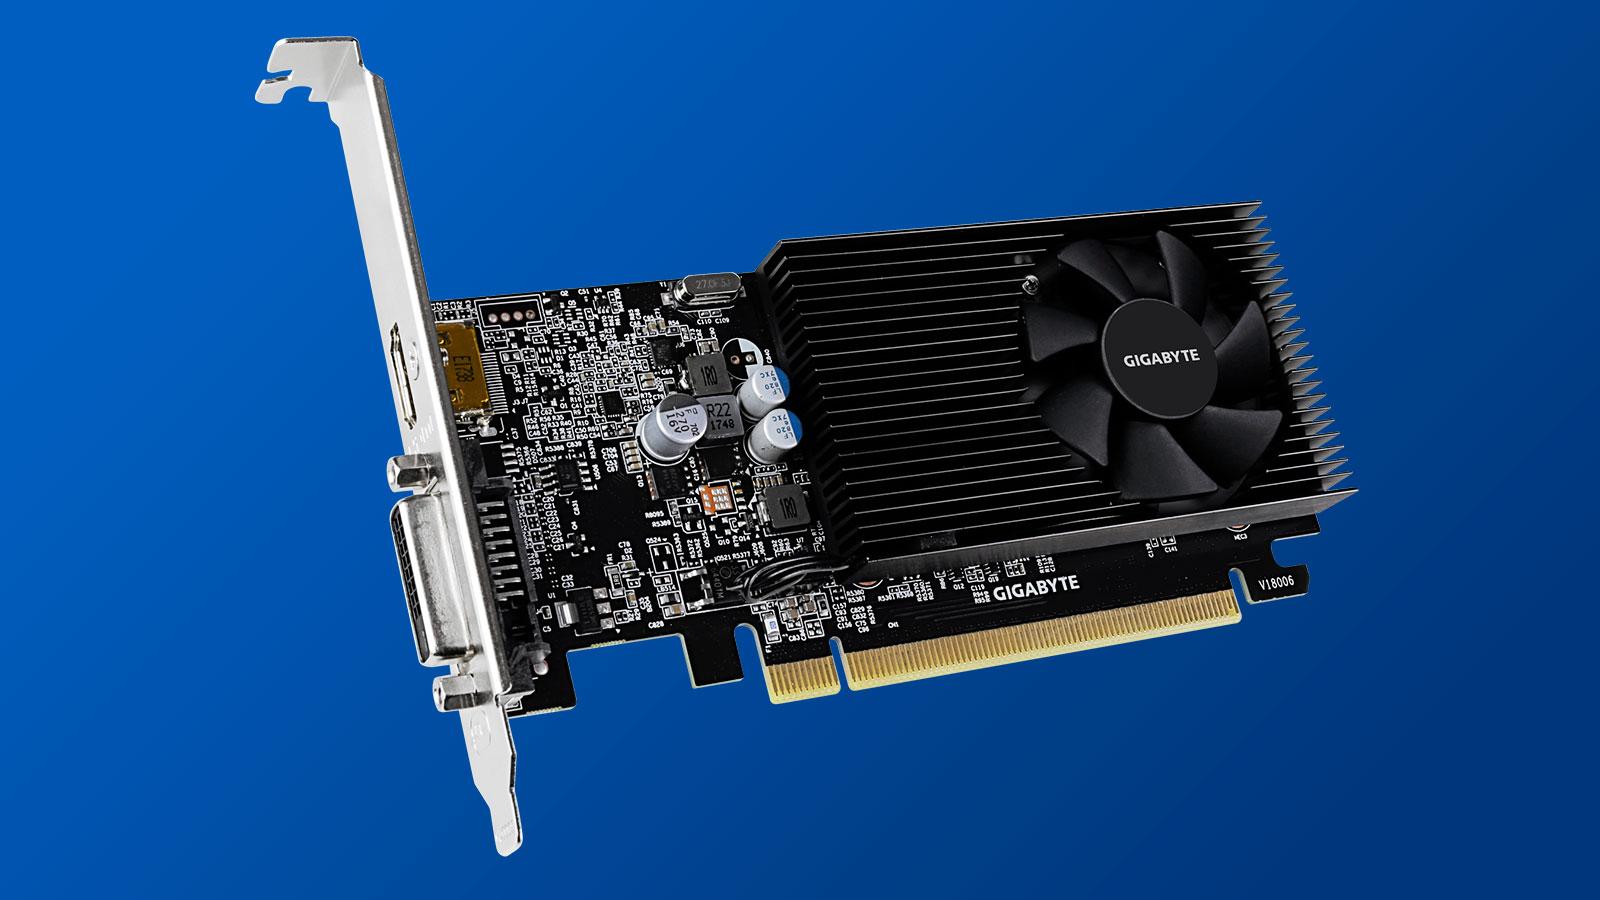 Gigabyte GeForce GTX 1030 Low Profile D4 2G